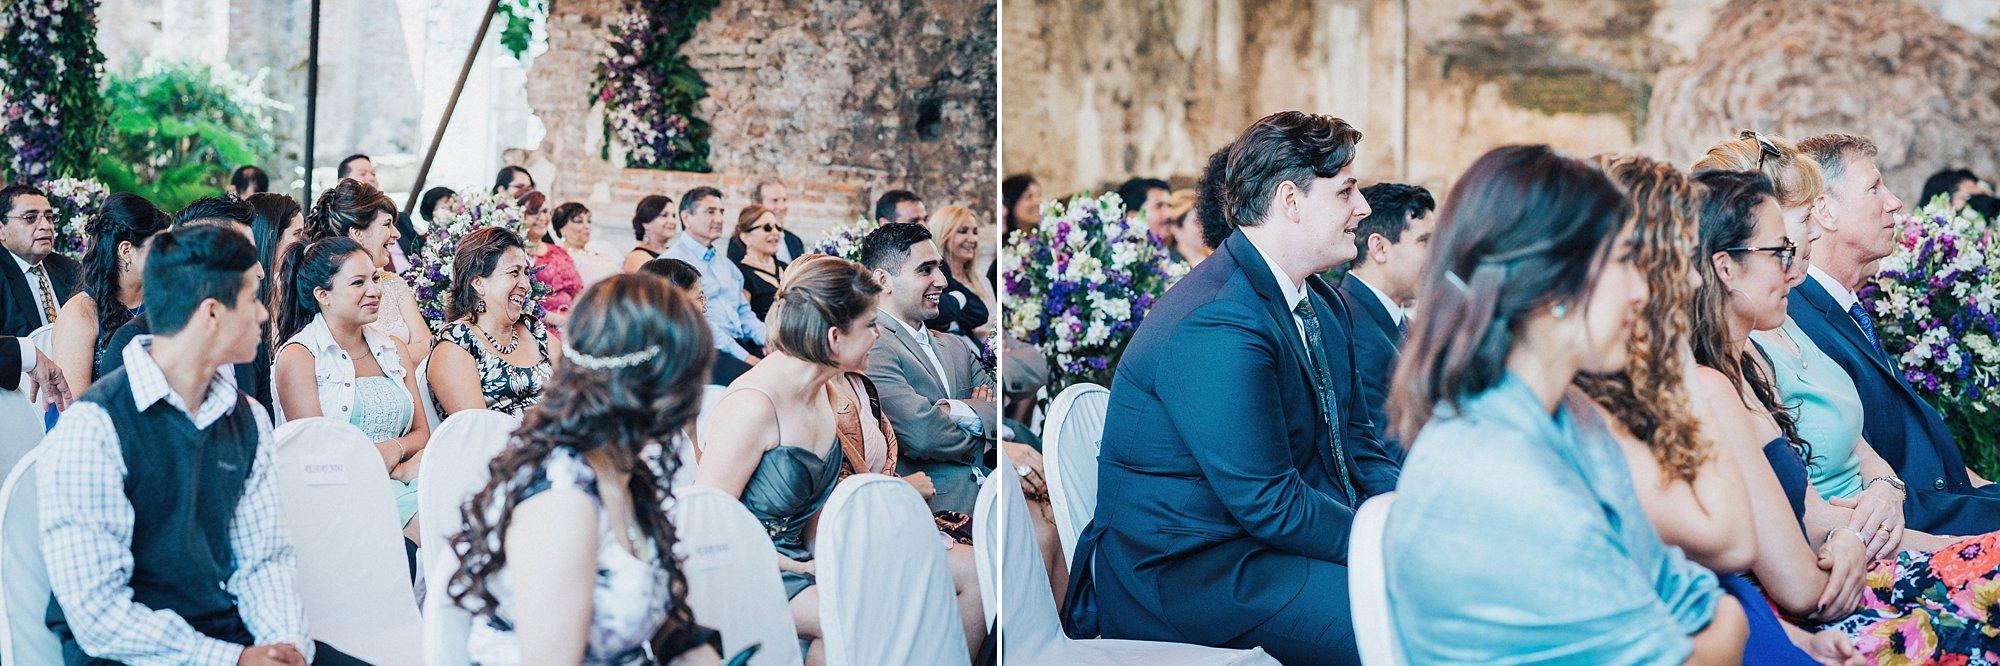 alex-yazmin-wedding-photographer-antigua-guatemala-075